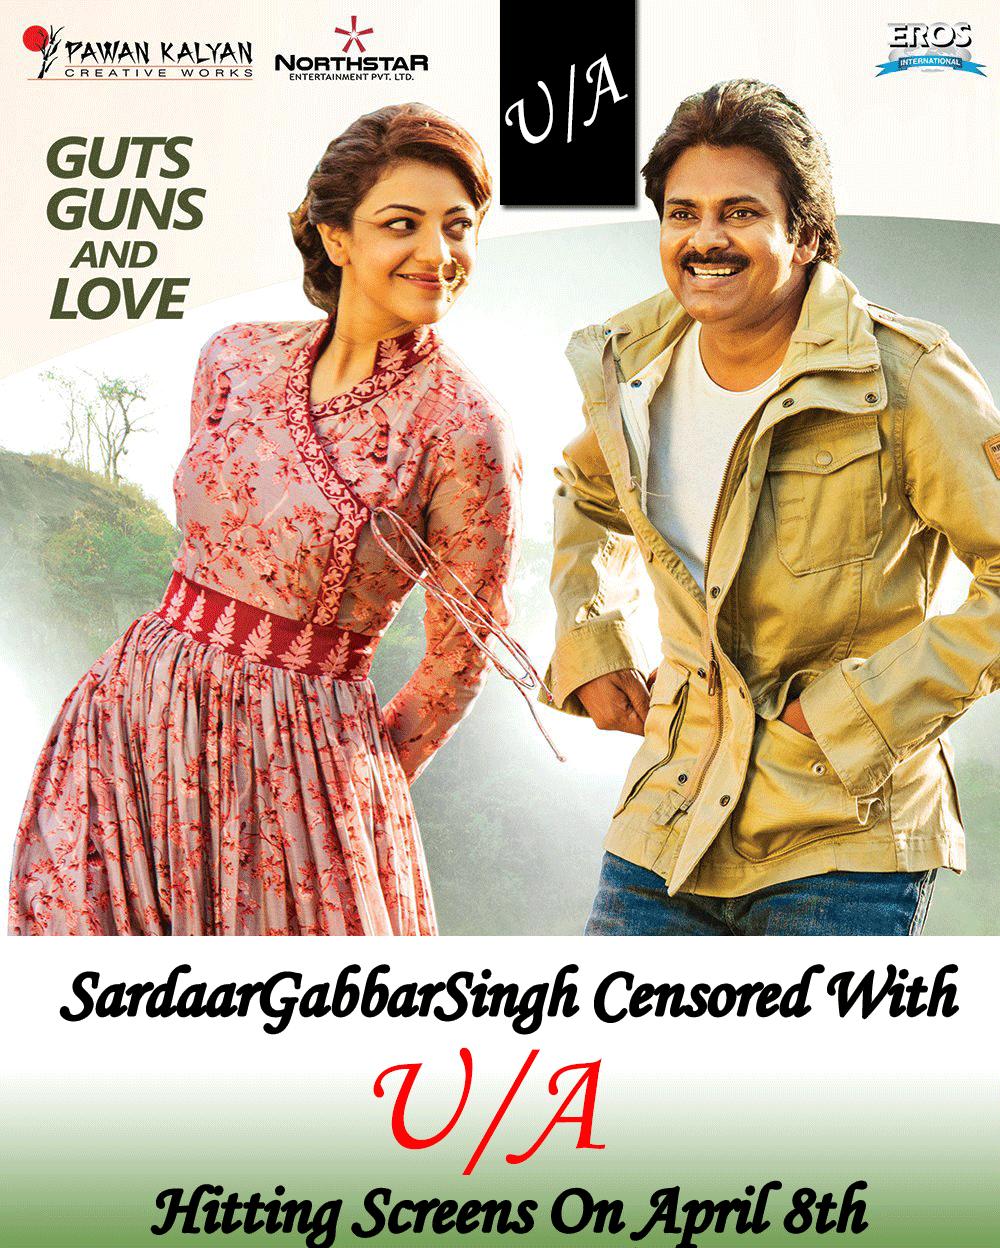 Sardaar Gabbar Singh Movie gets Censored with U/A Certificate